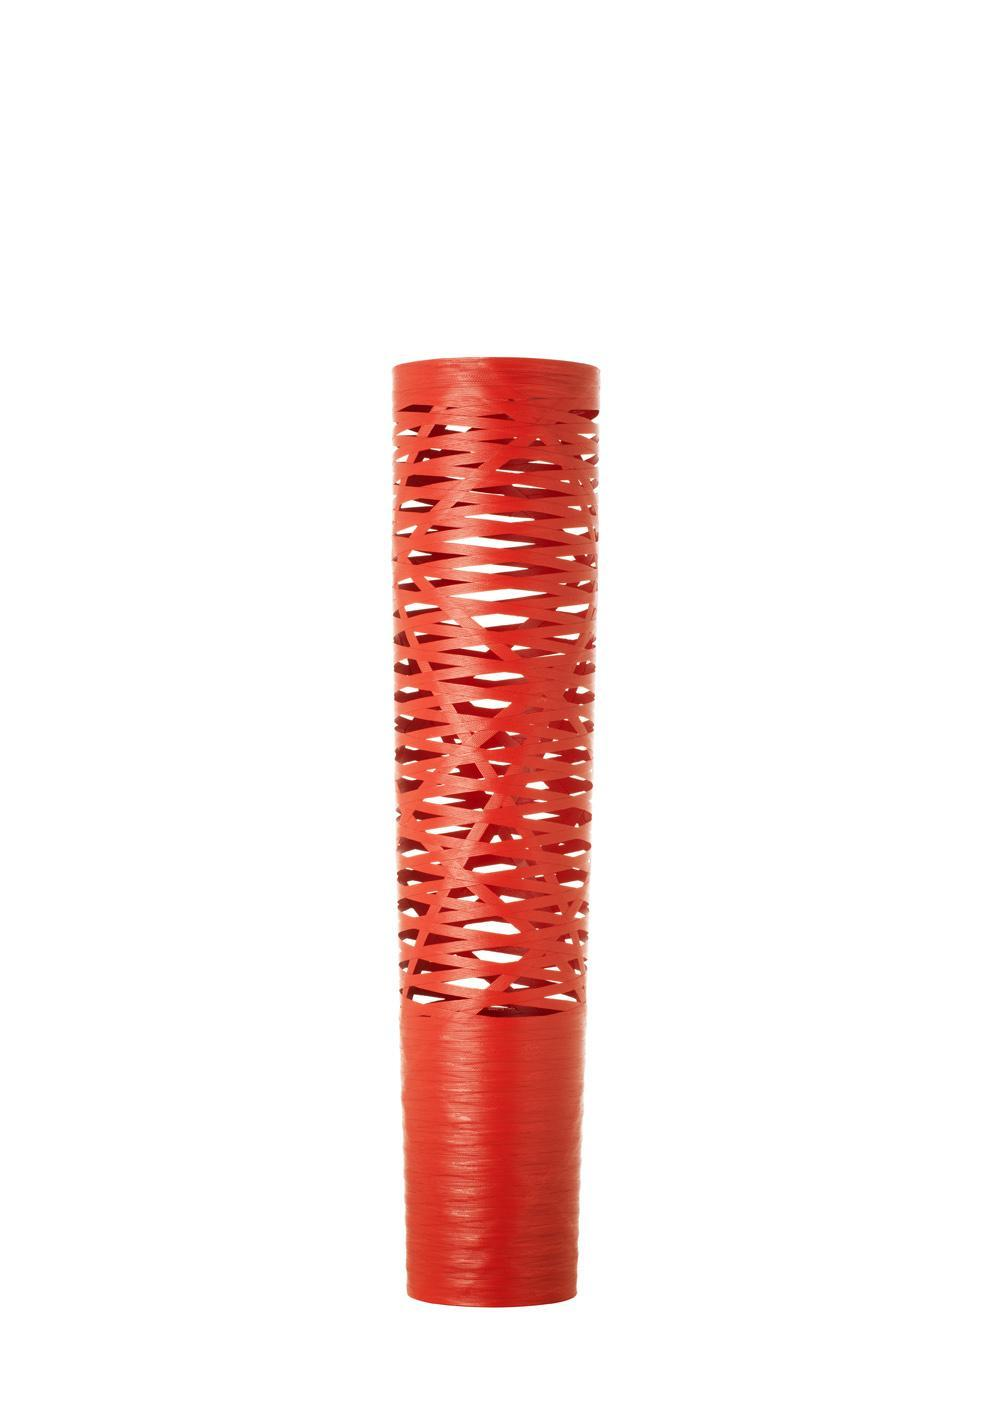 Foscarini Tress vloerlamp-Rood-Media